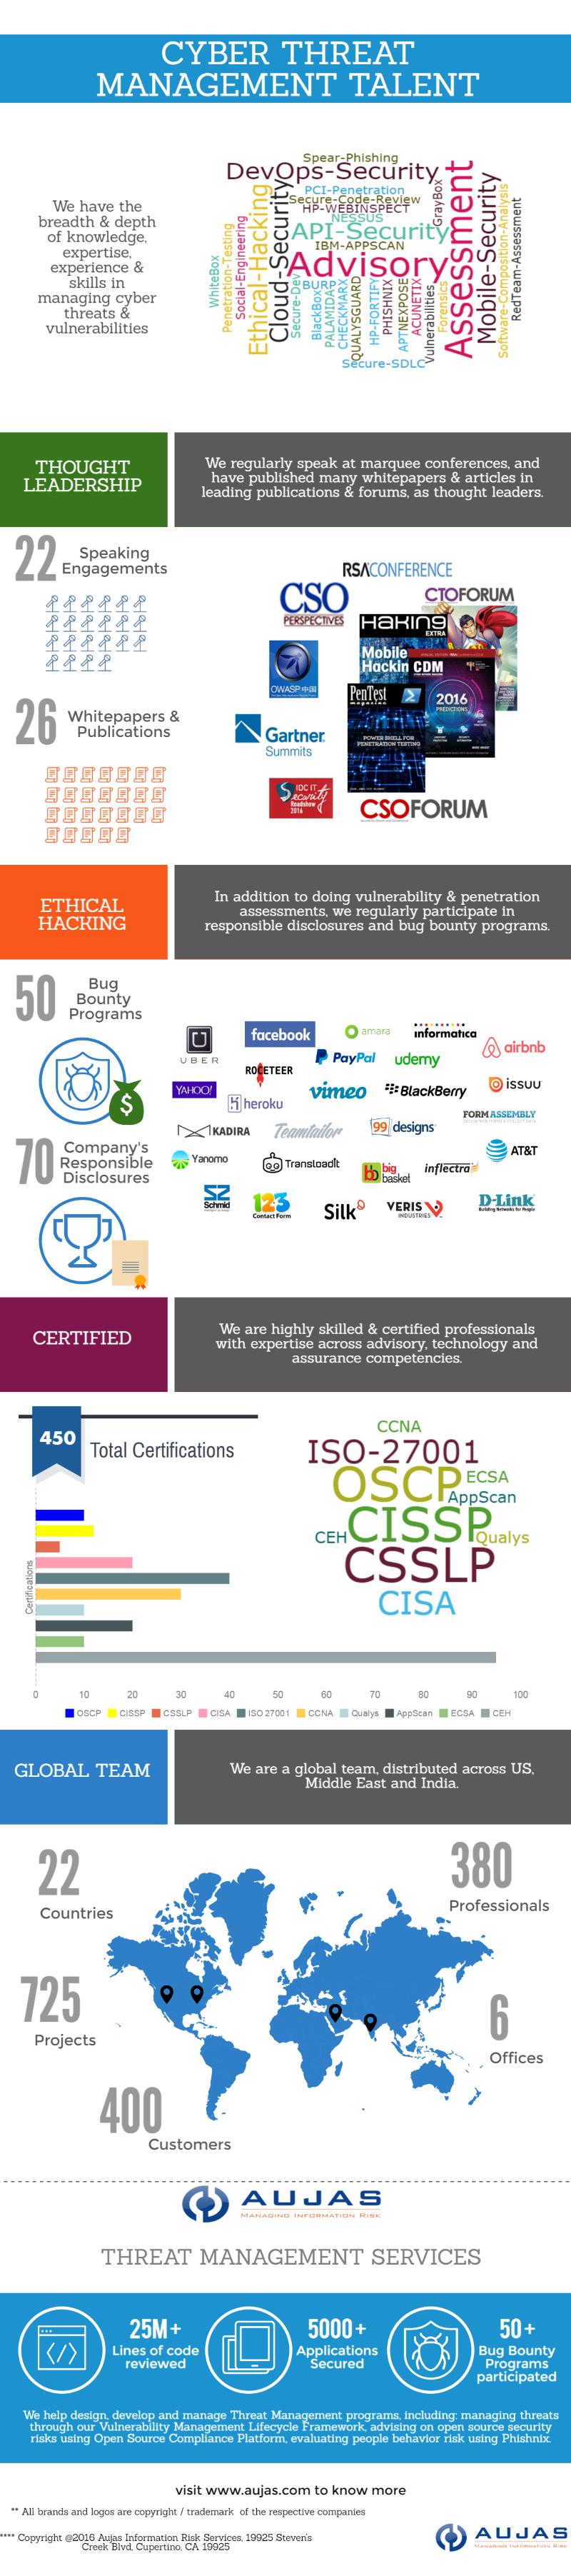 Aujas Cyber Threat & Vulnerability Management Skills